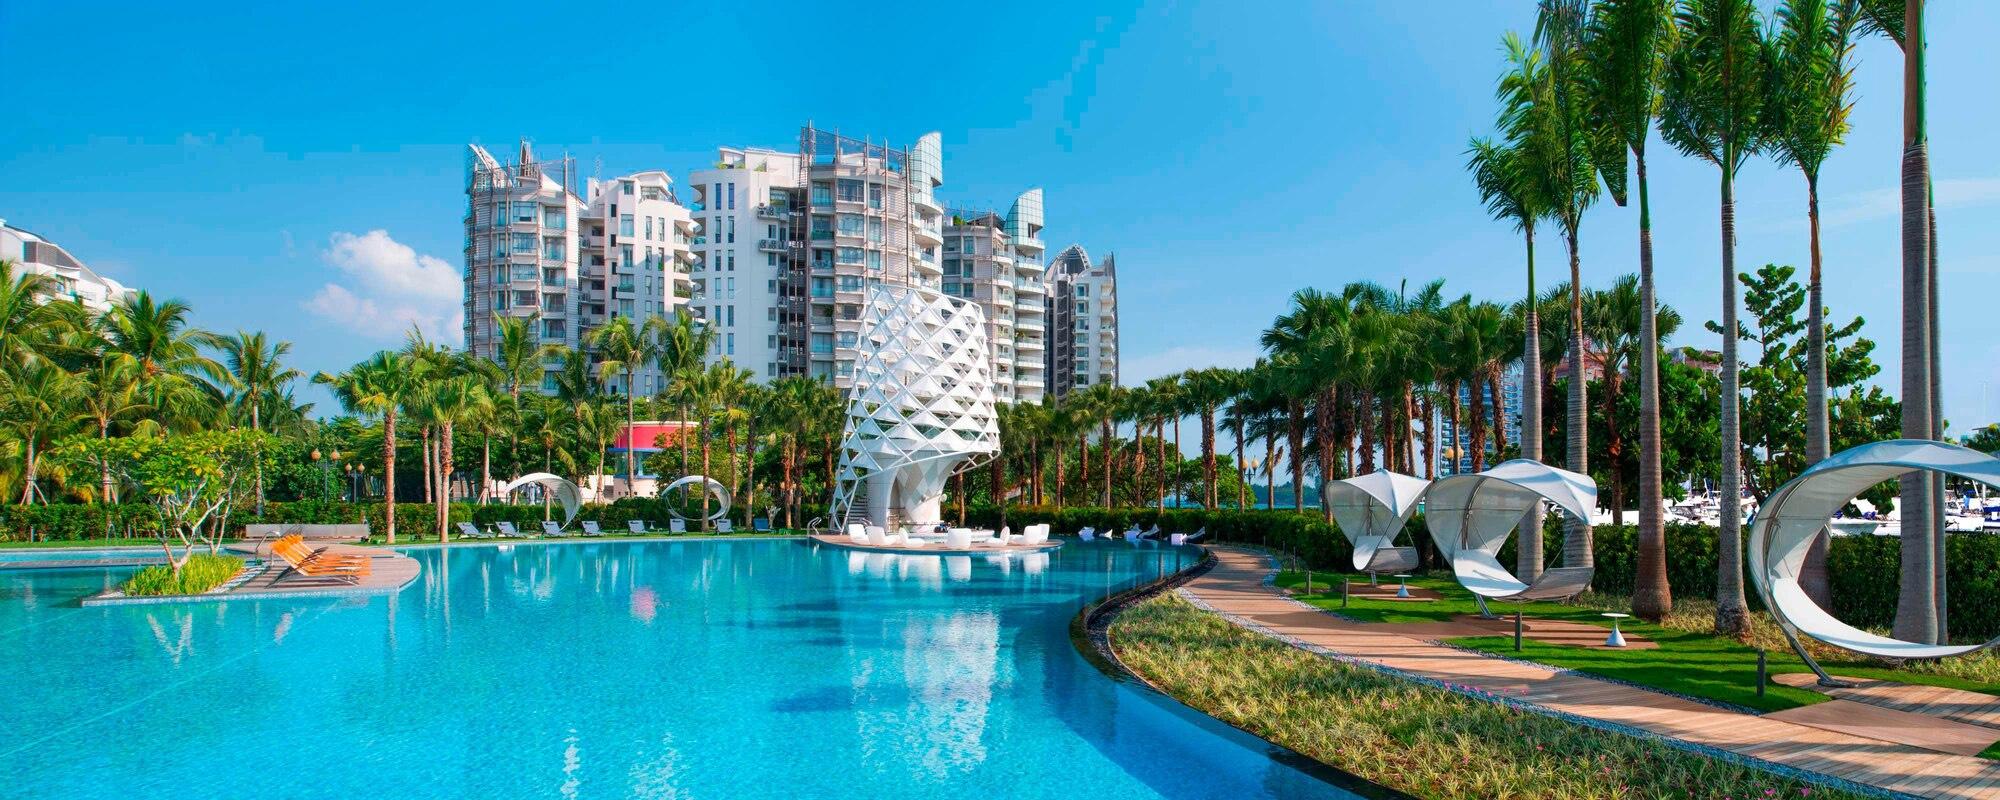 W Hotel Singapore Pool (Marriott)